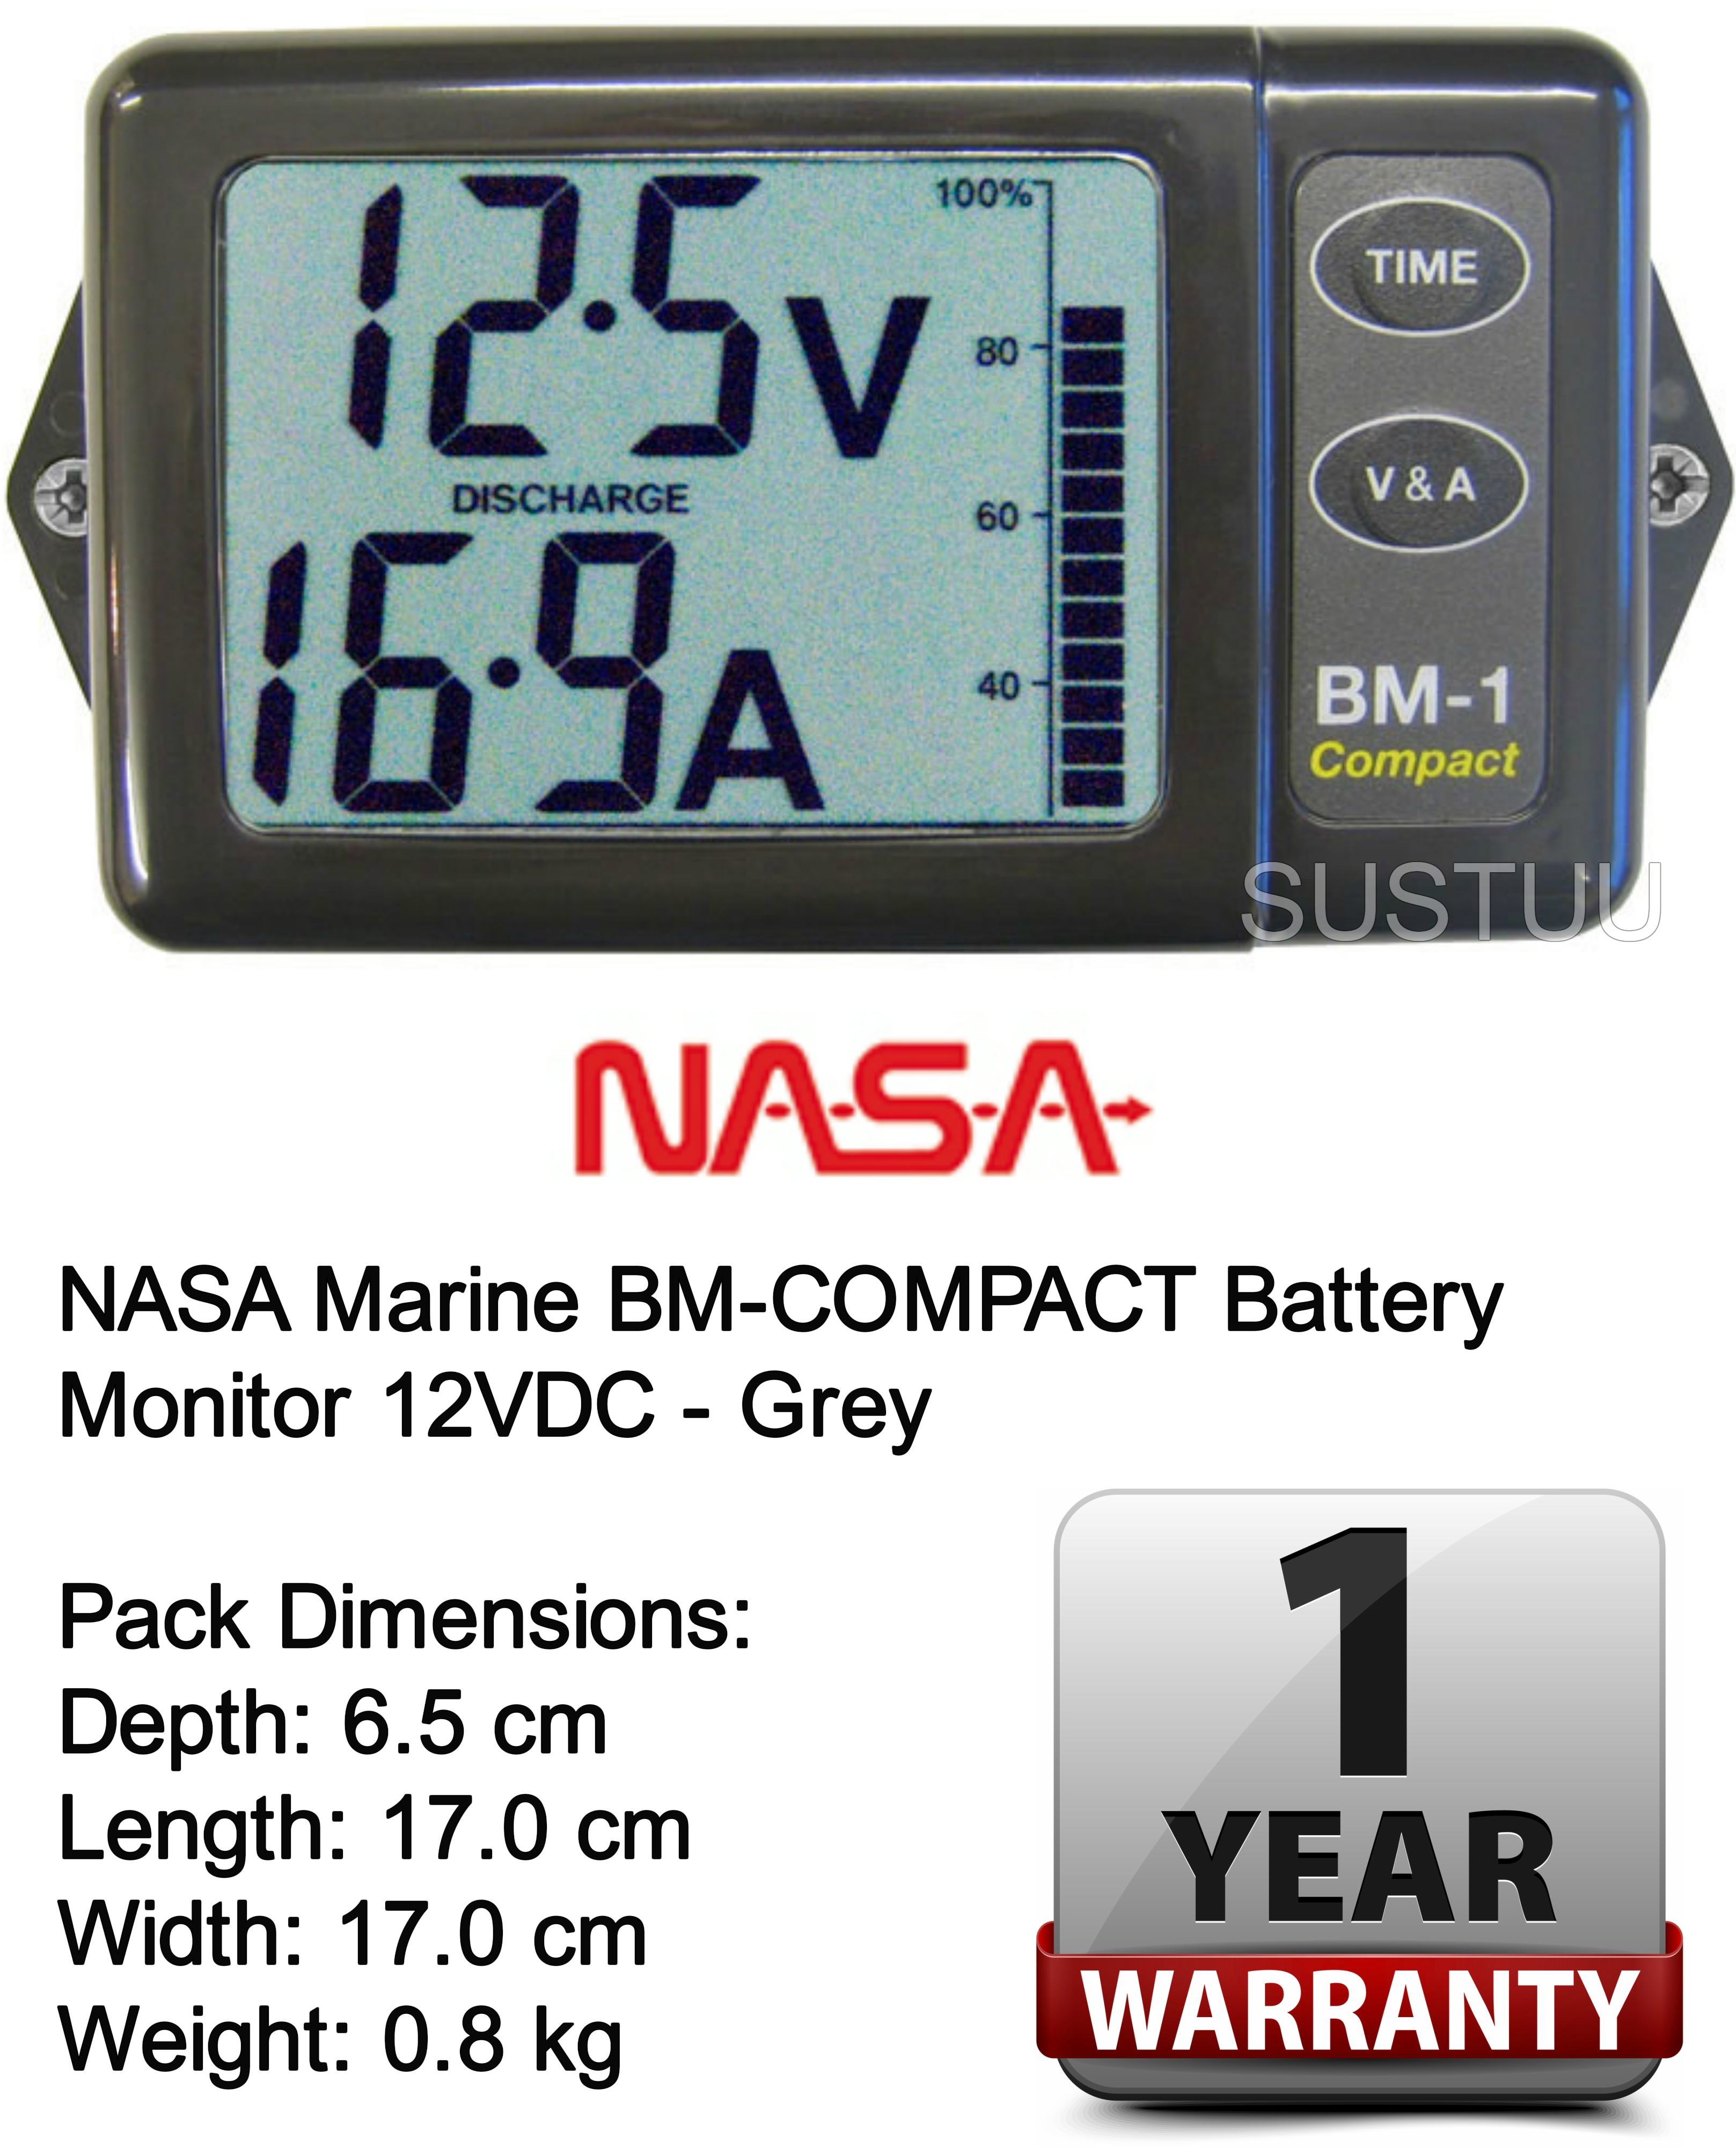 Marine Digital Battery Monitor : Nasa marine bm compact battery monitor vdc grey ebay